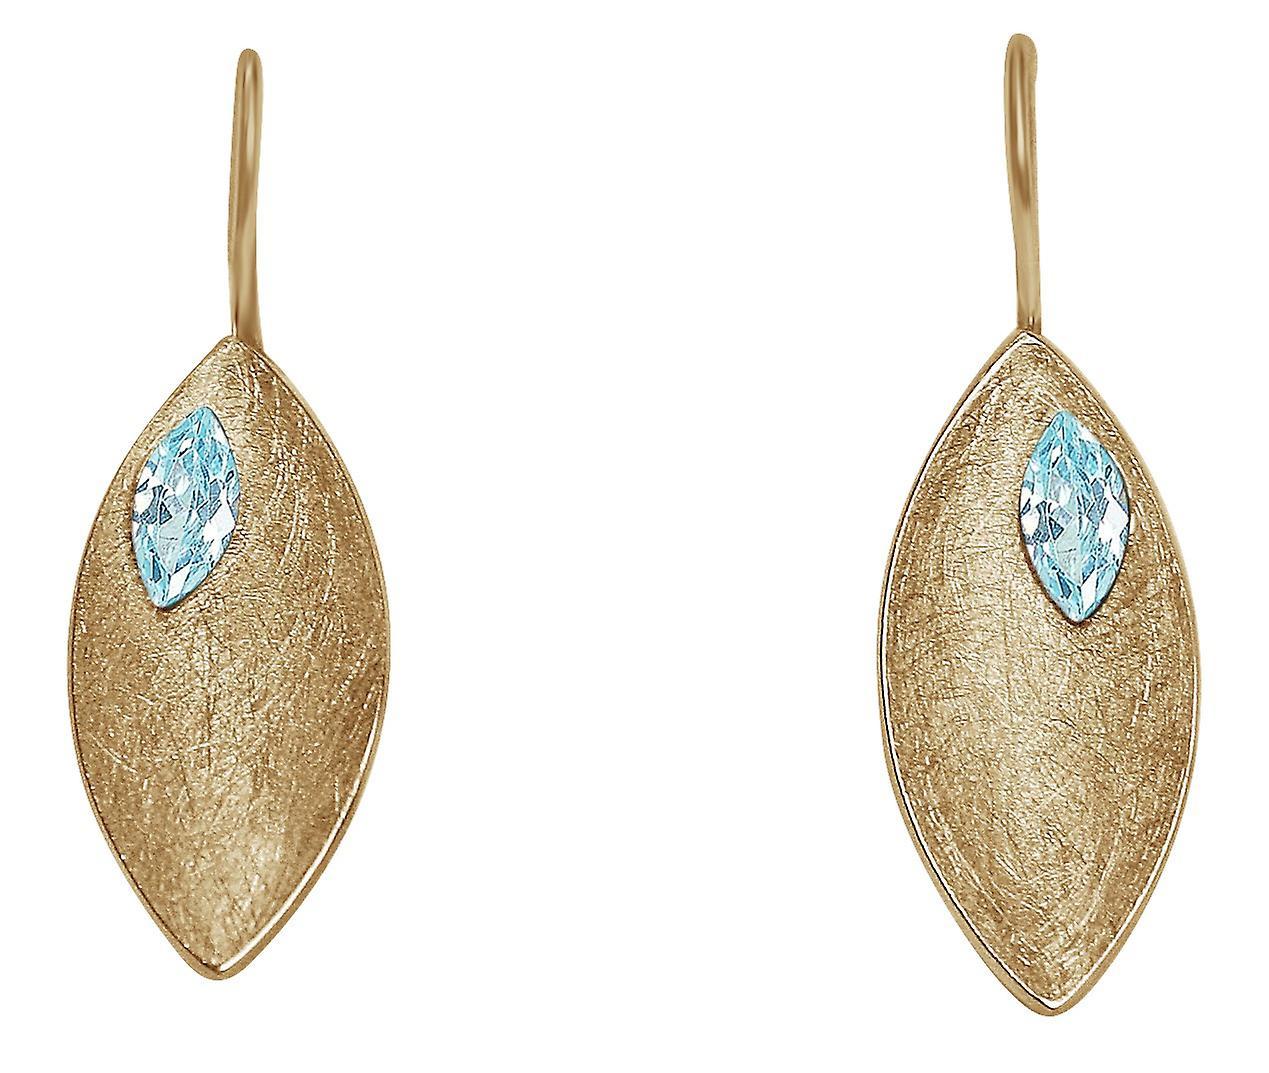 Gemshine - femmes - Ohrbaguee - boucles d'oreilles - 925 argent - Veroret - Marquise - Minimalistisch - Design - Topas - bleu - 3 cm